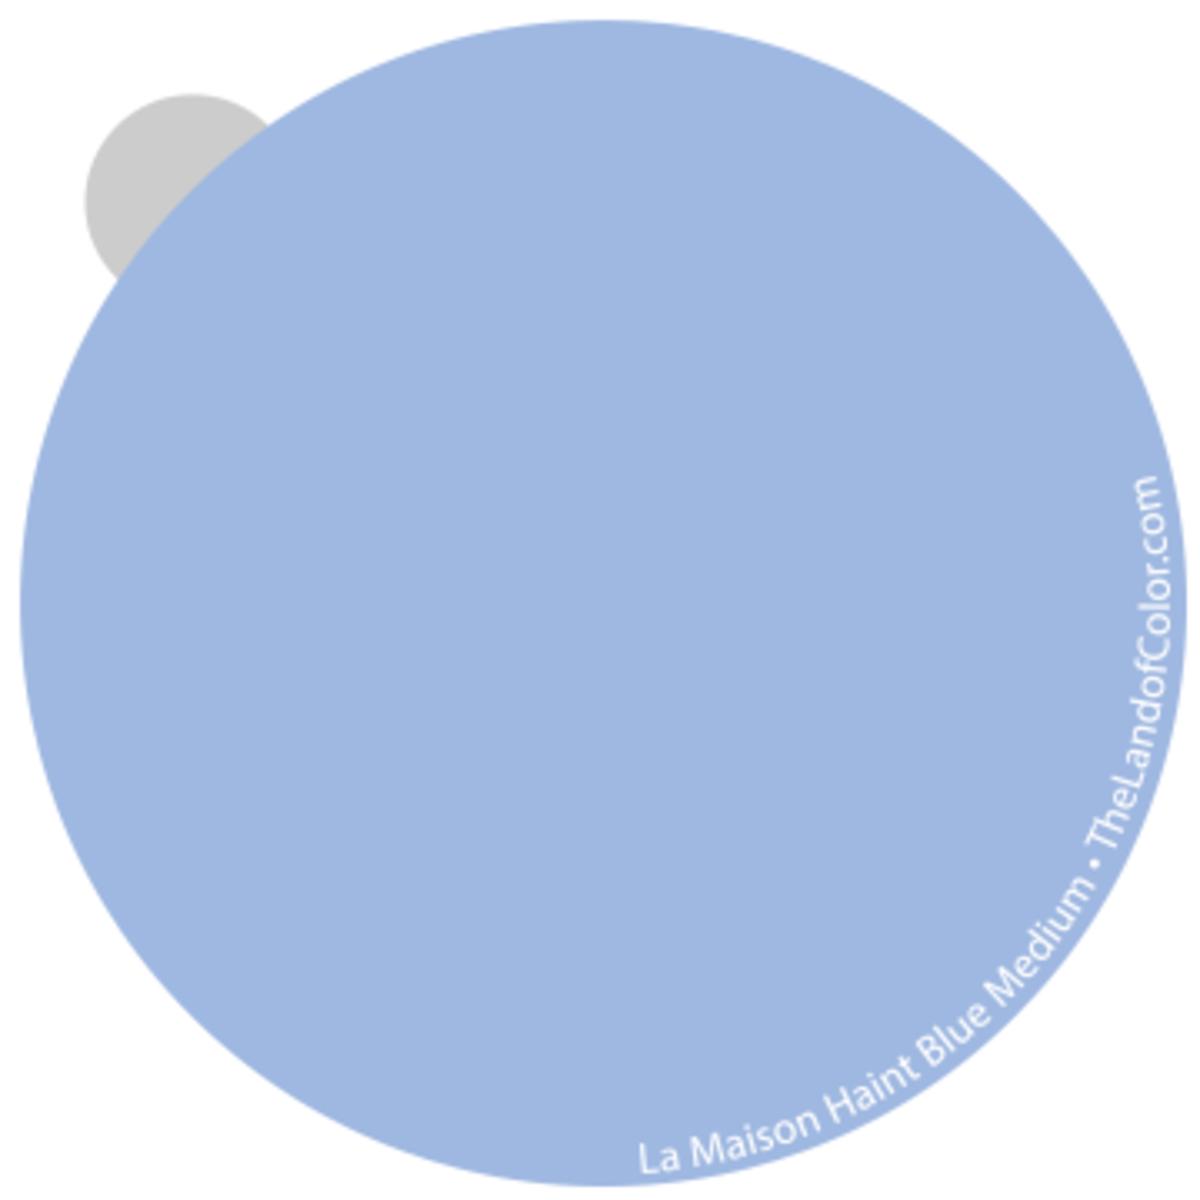 Haint Blue  La Maison - Medium